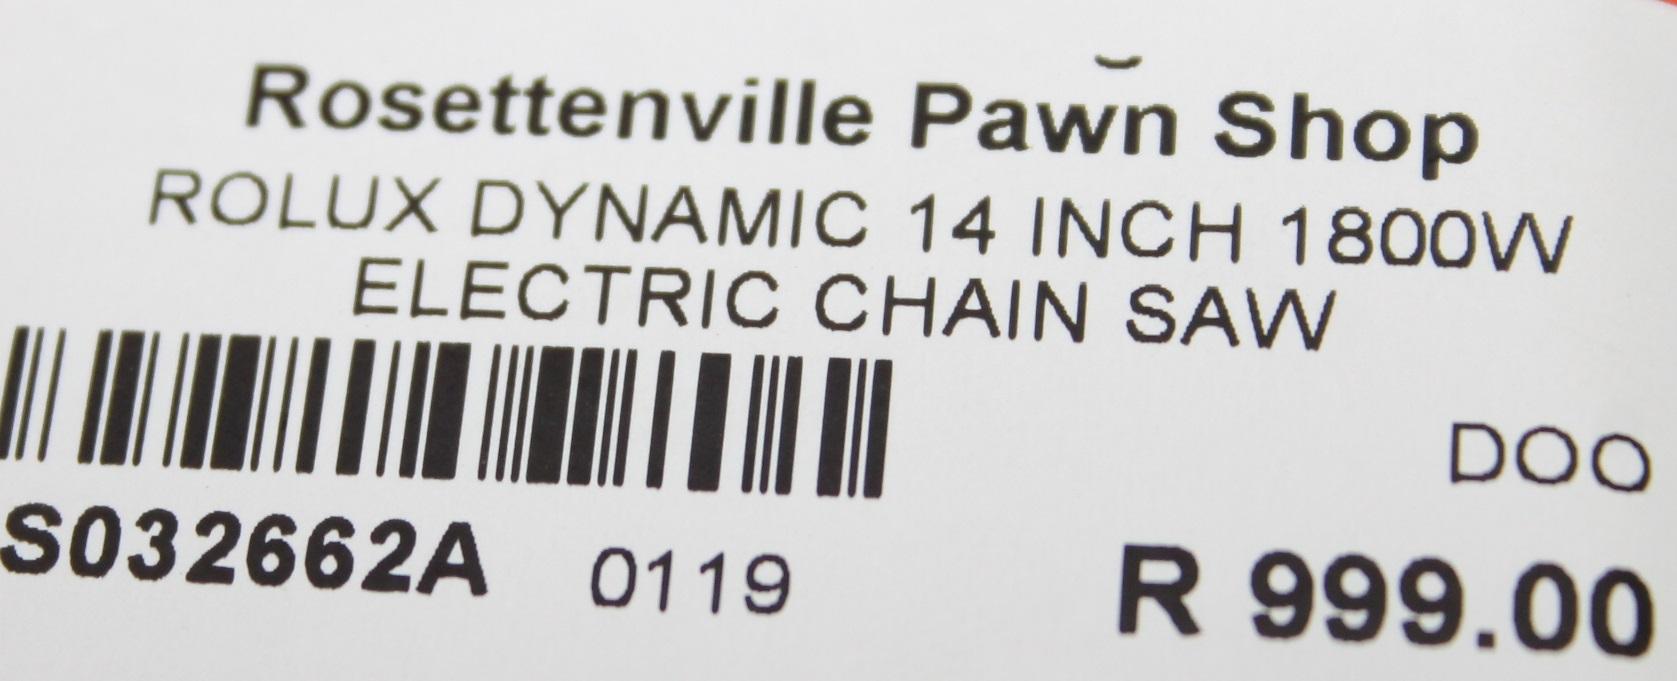 Rolux dynamic 14 inch 1800w electric chain saw S032662A #Rosettenvillepawnshop